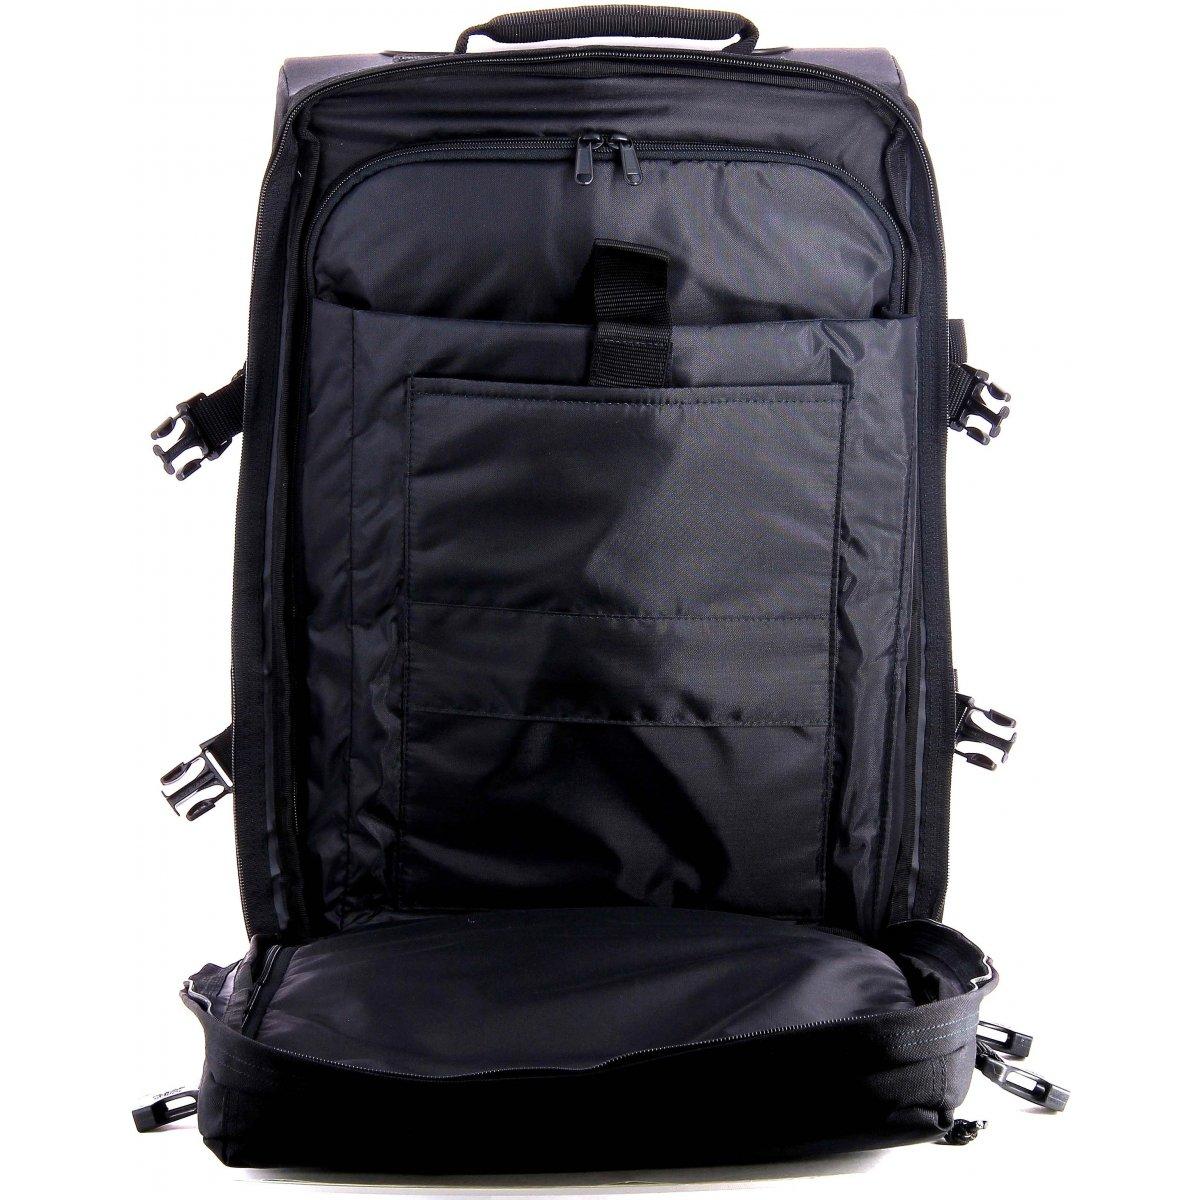 sac de voyage dos roulettes eastpak ek956 ek956008 couleur principale 008 black. Black Bedroom Furniture Sets. Home Design Ideas